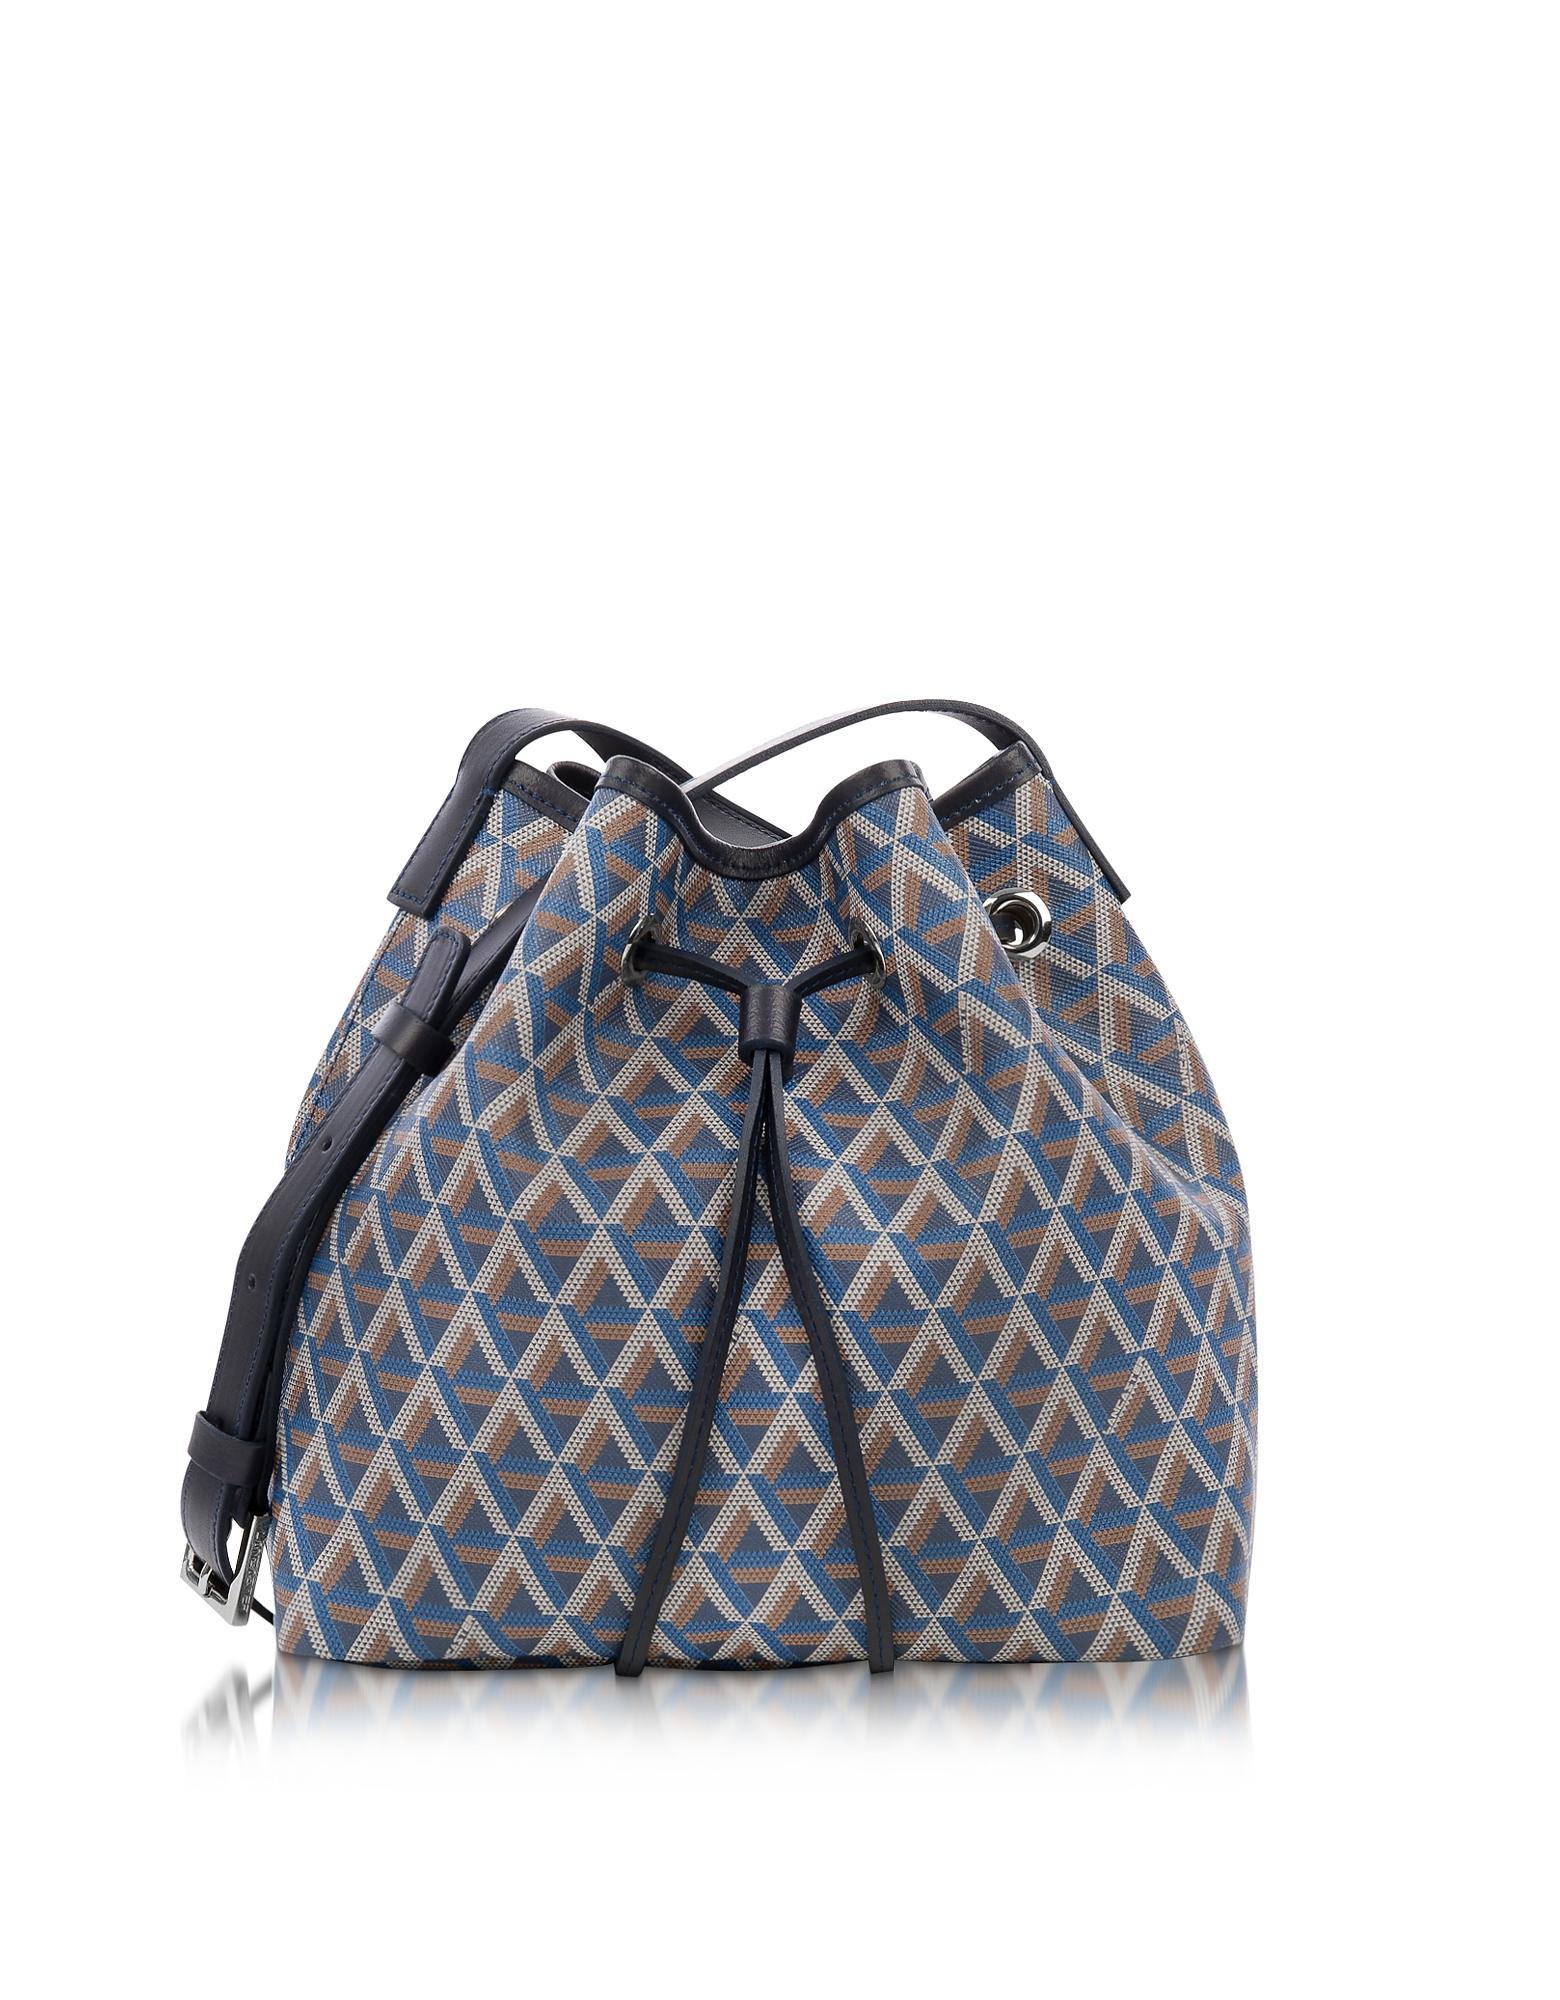 0750fd84ea02 Lancaster Paris Ikon Small Coated Canvas Bucket Bag in Blue - Lyst